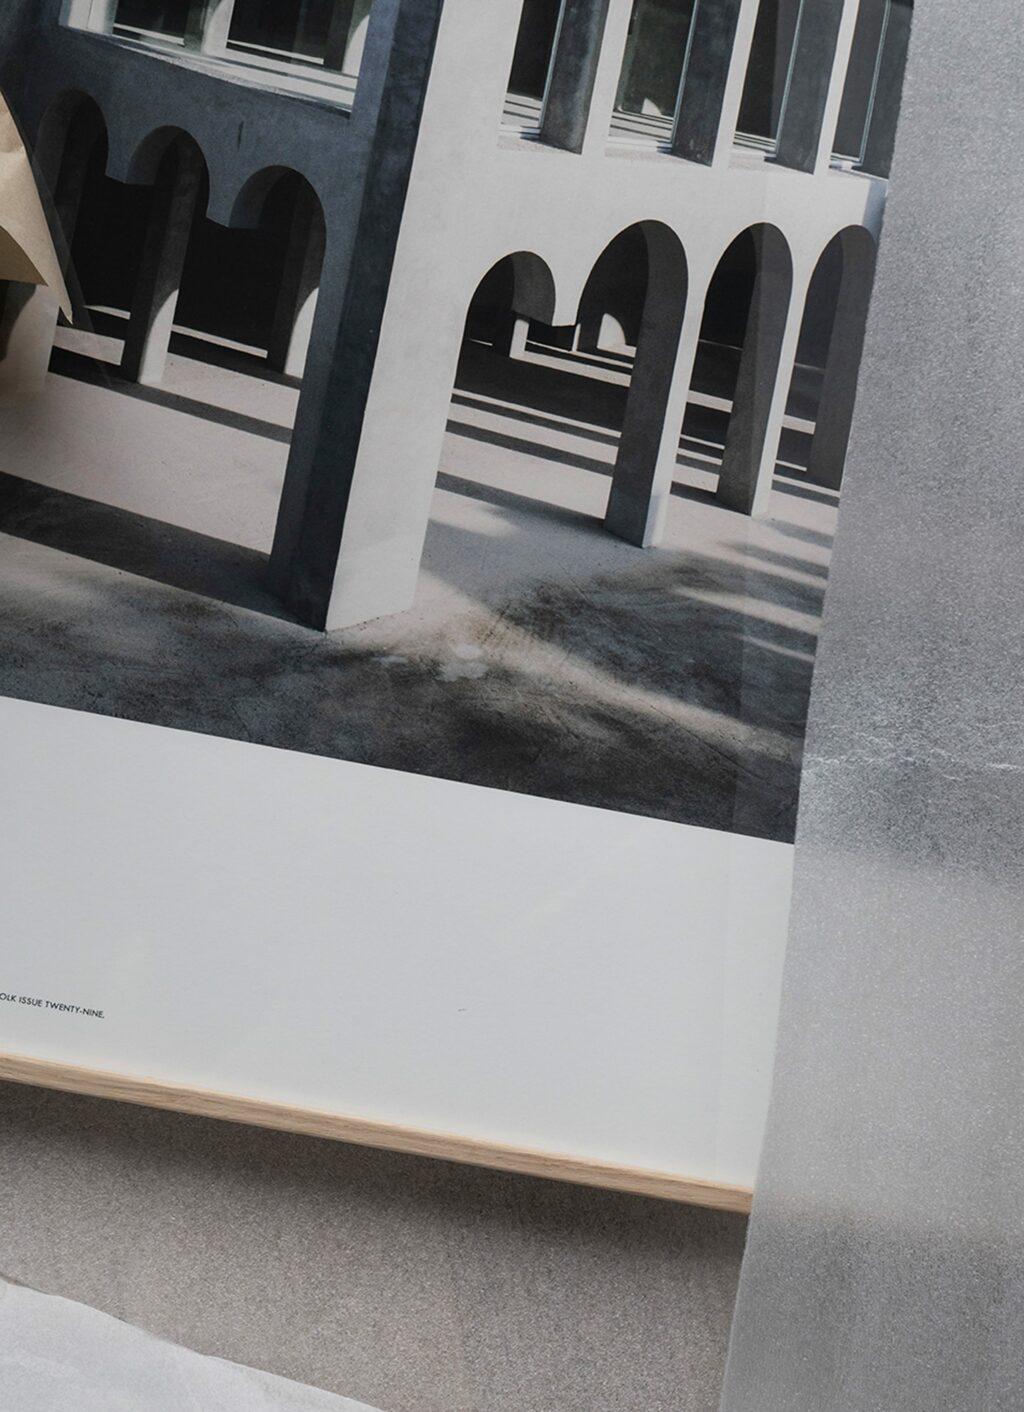 Alium Special Edition for Kinfolk - Art Print - Salva Lopez - Xavier Corbero - 01 - 50x70cm